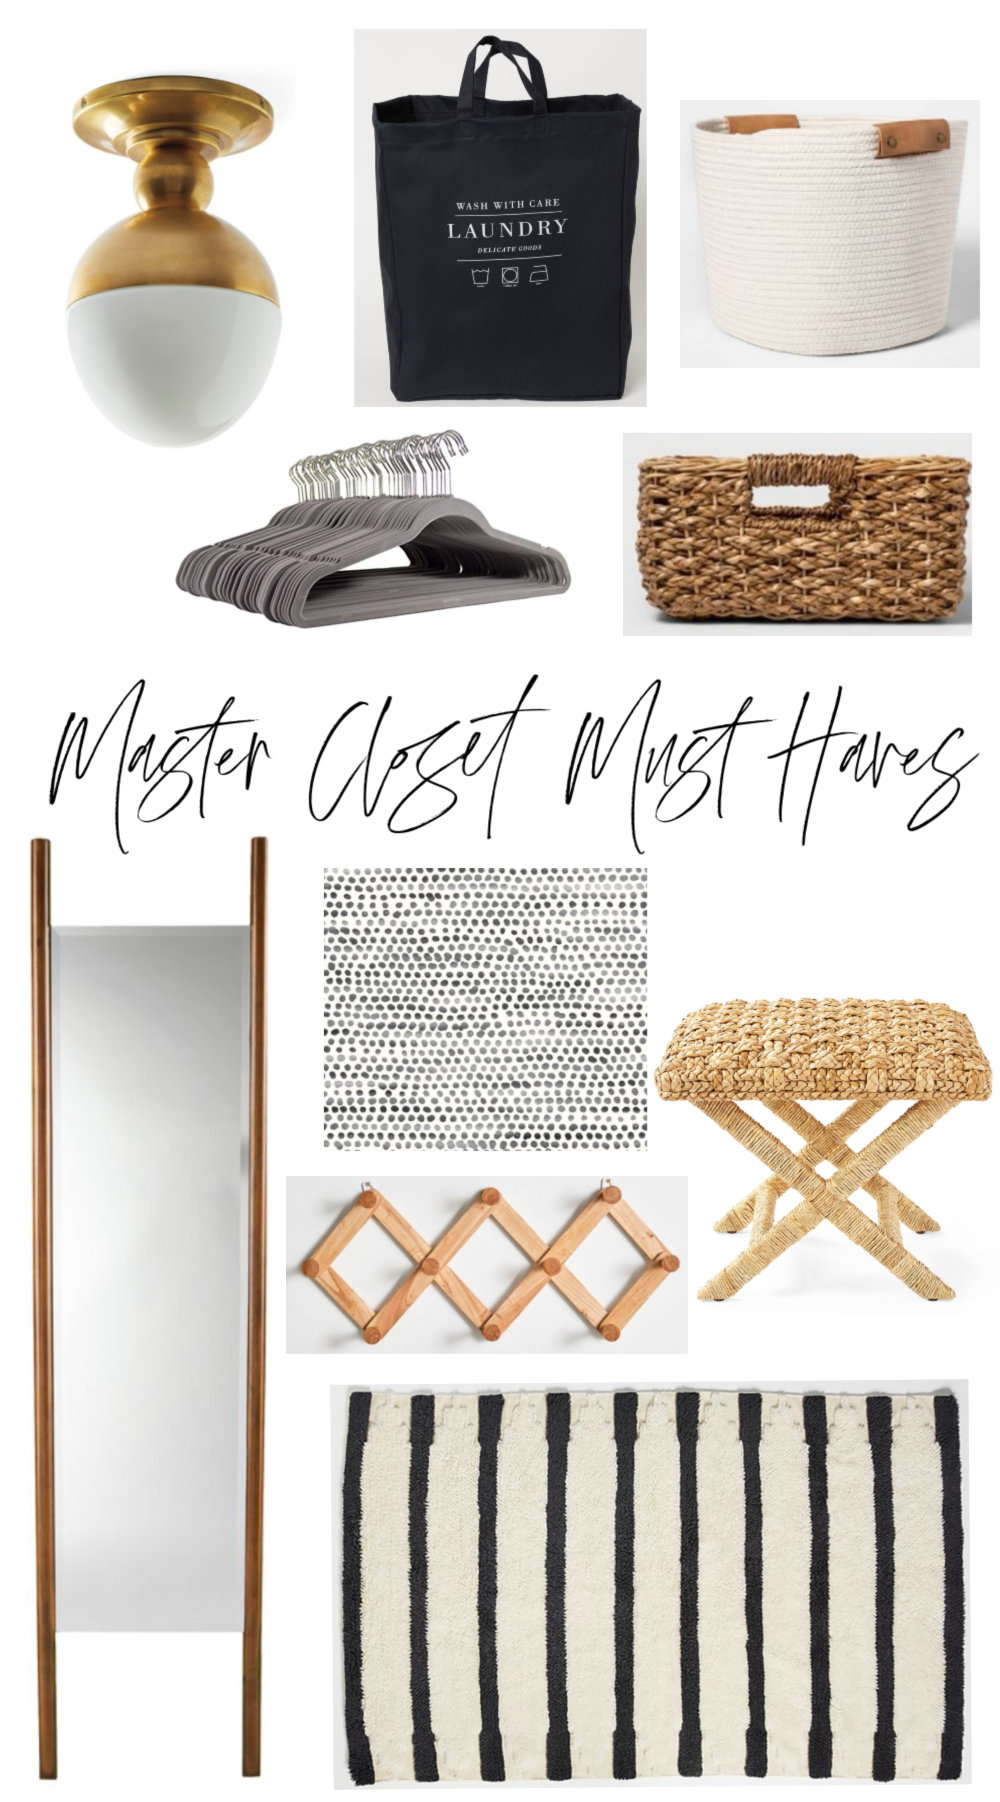 Master Closet Must Haves